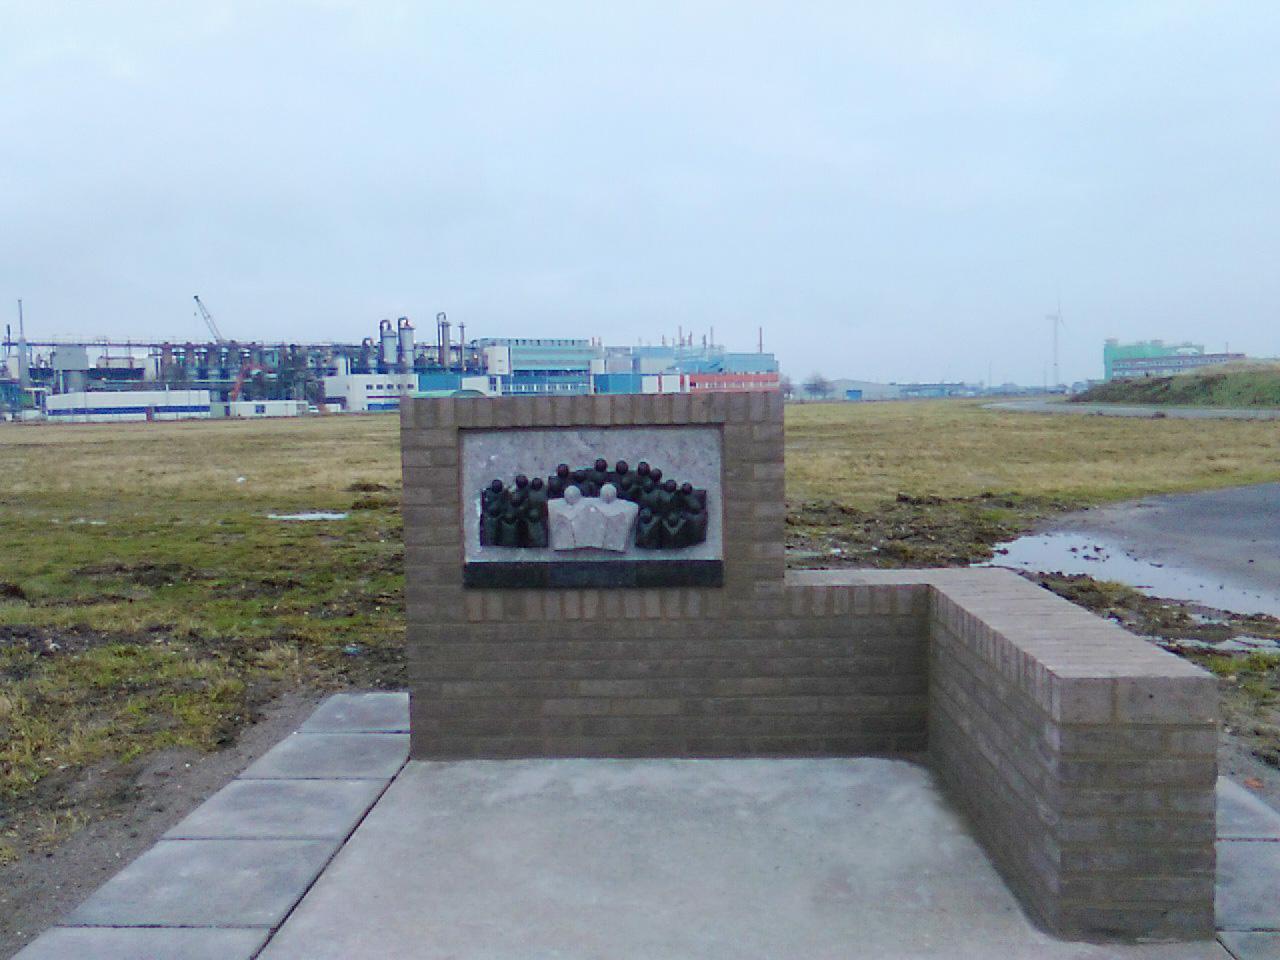 Monument Thermphos, Vlissingen-Oost